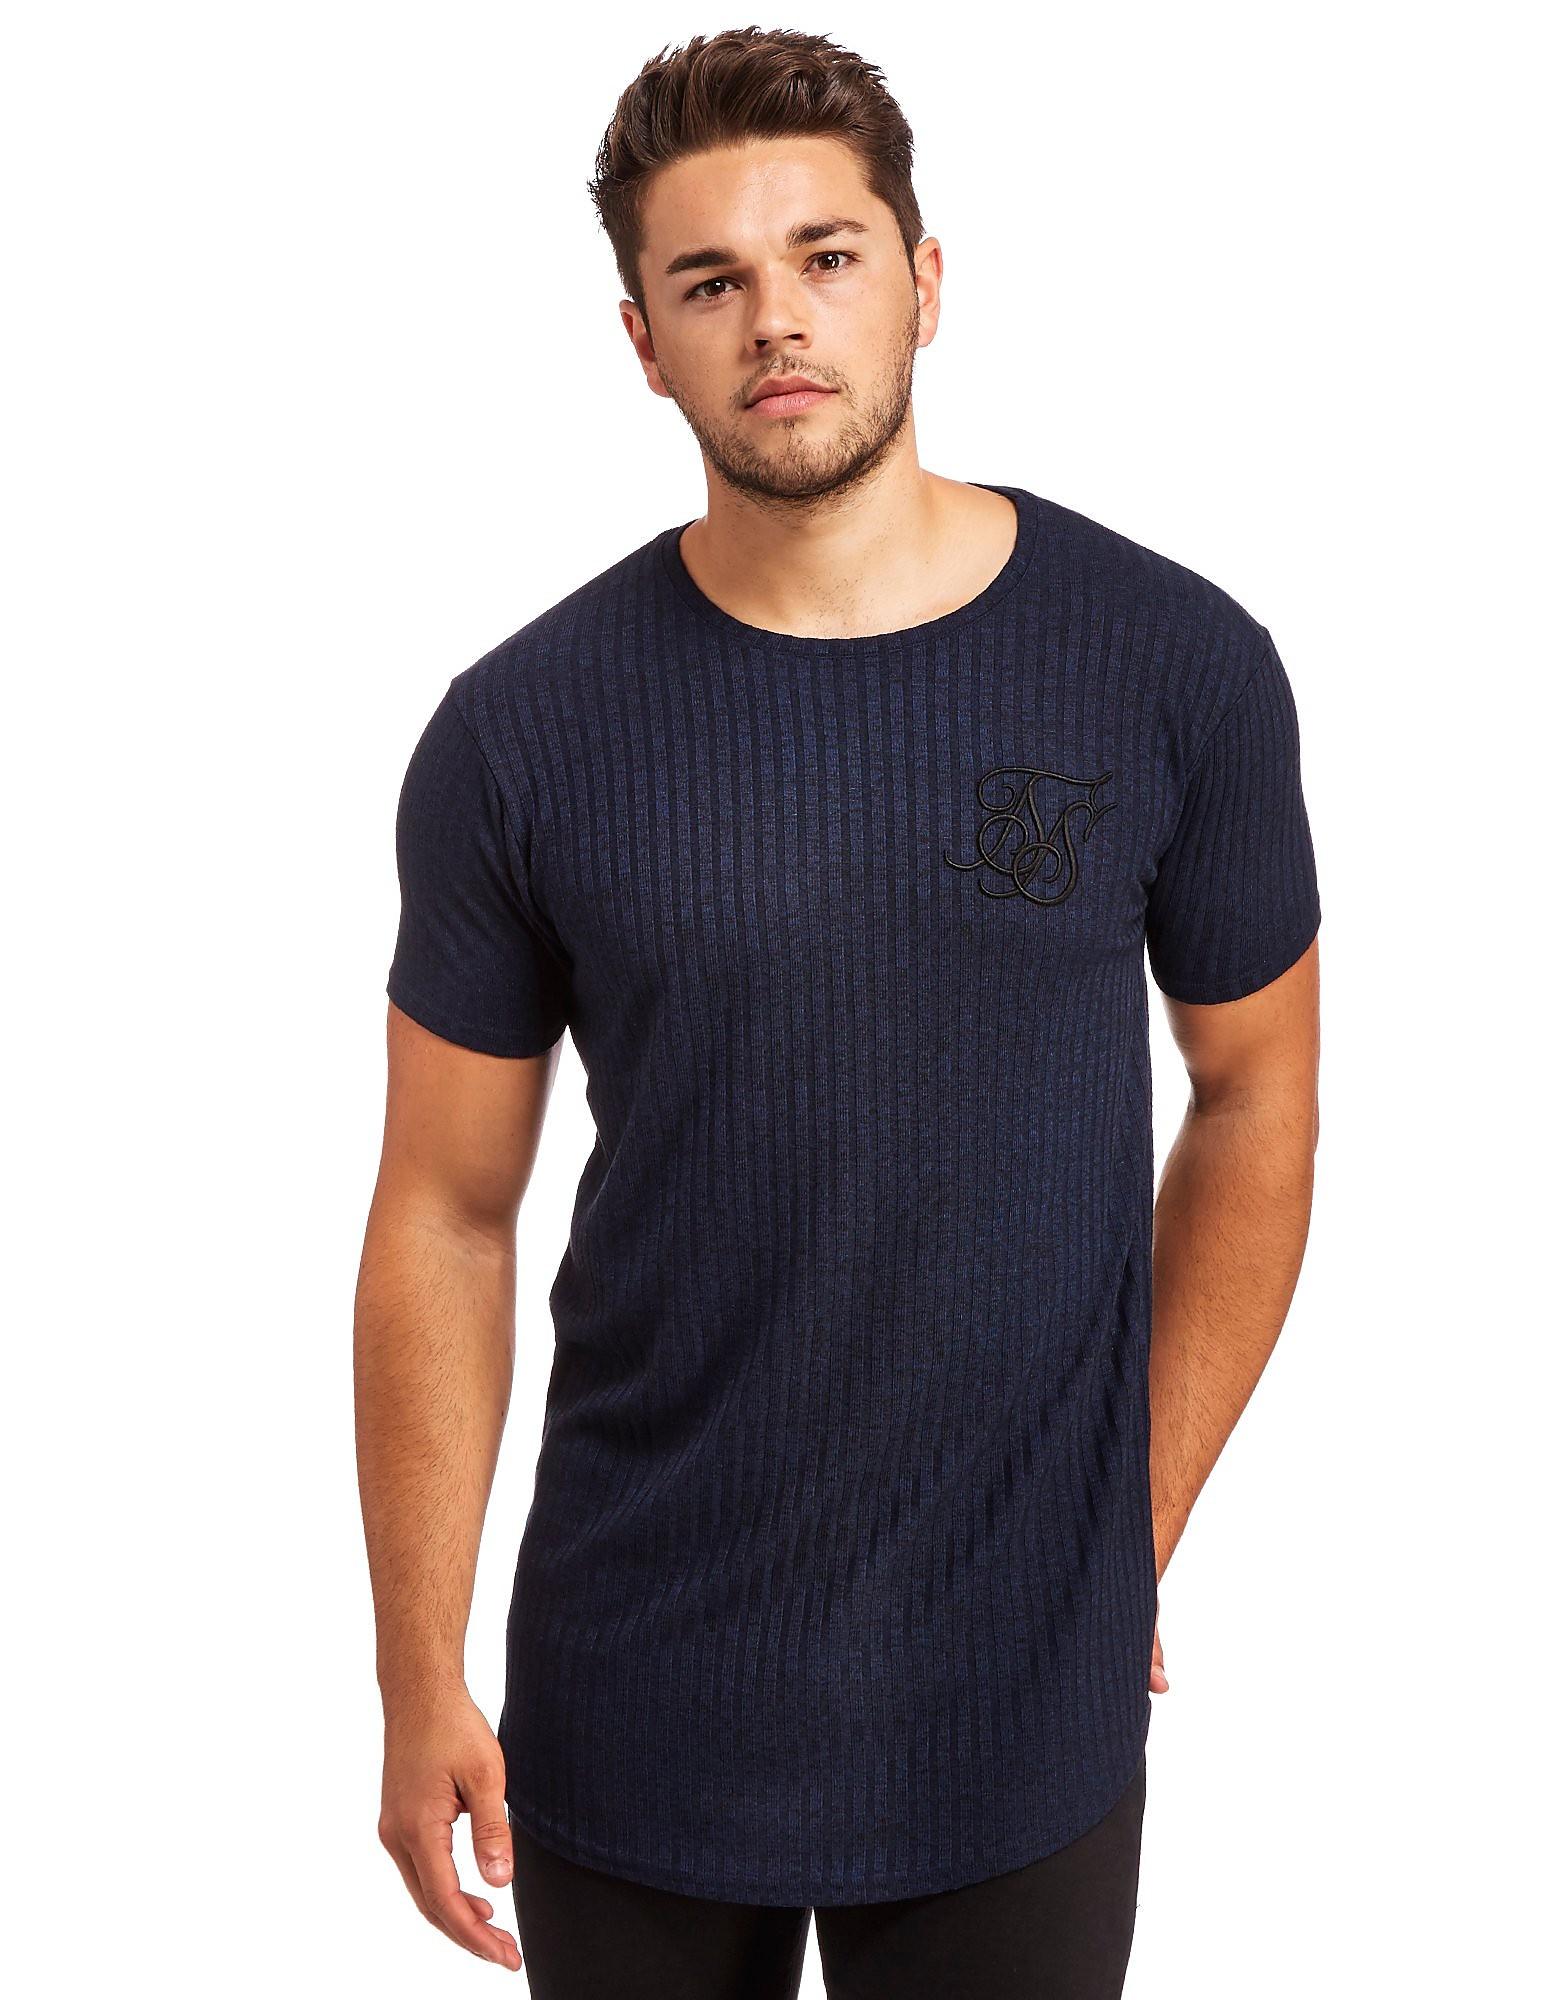 SikSilk Rib Curved Hem Knit T-Shirt